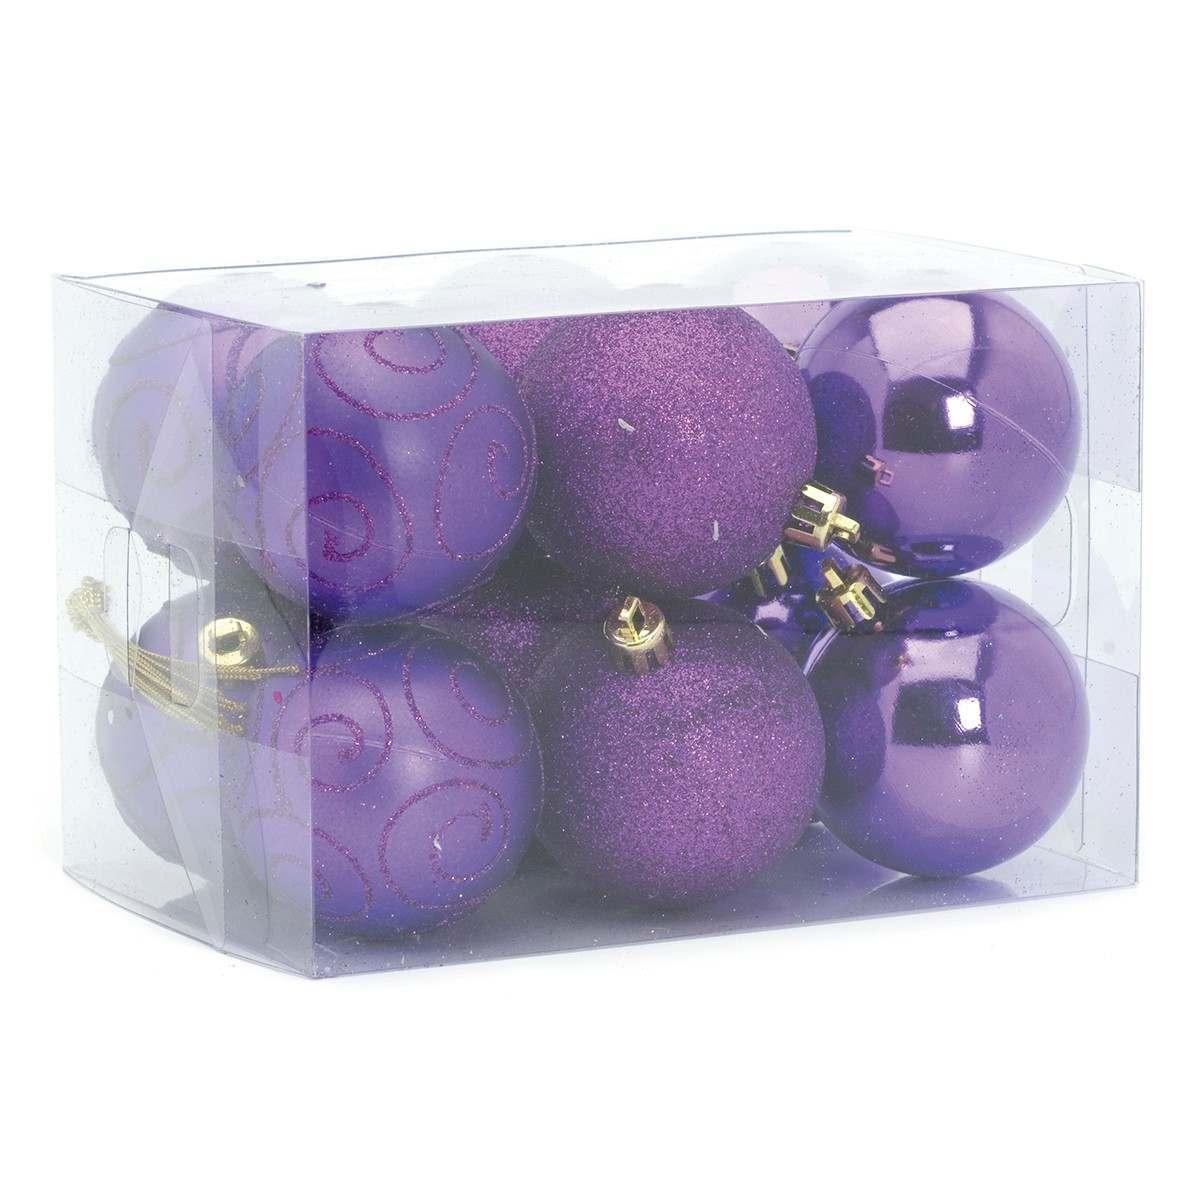 12 x 60m Assorted Matt Shiny Glitter Purple Shatterproof Baubles